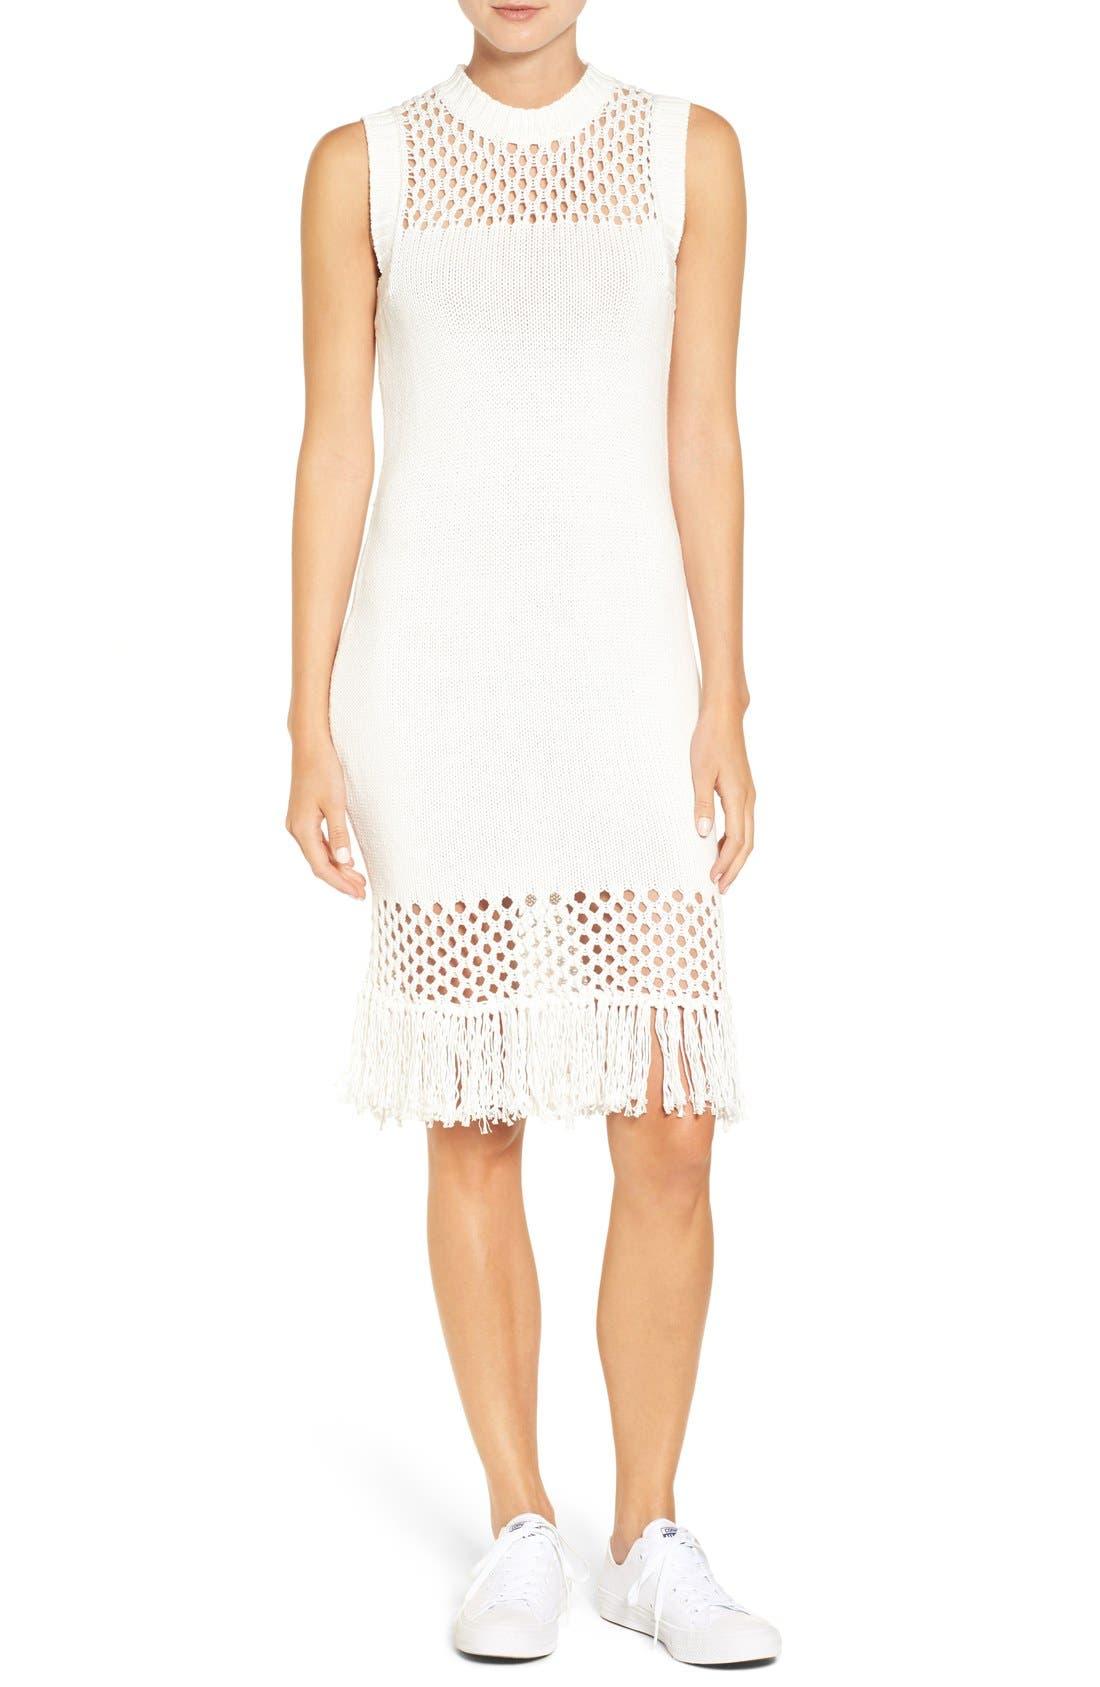 Alternate Image 1 Selected - Amour Vert 'Helen' Illusion Knit Cotton Dress